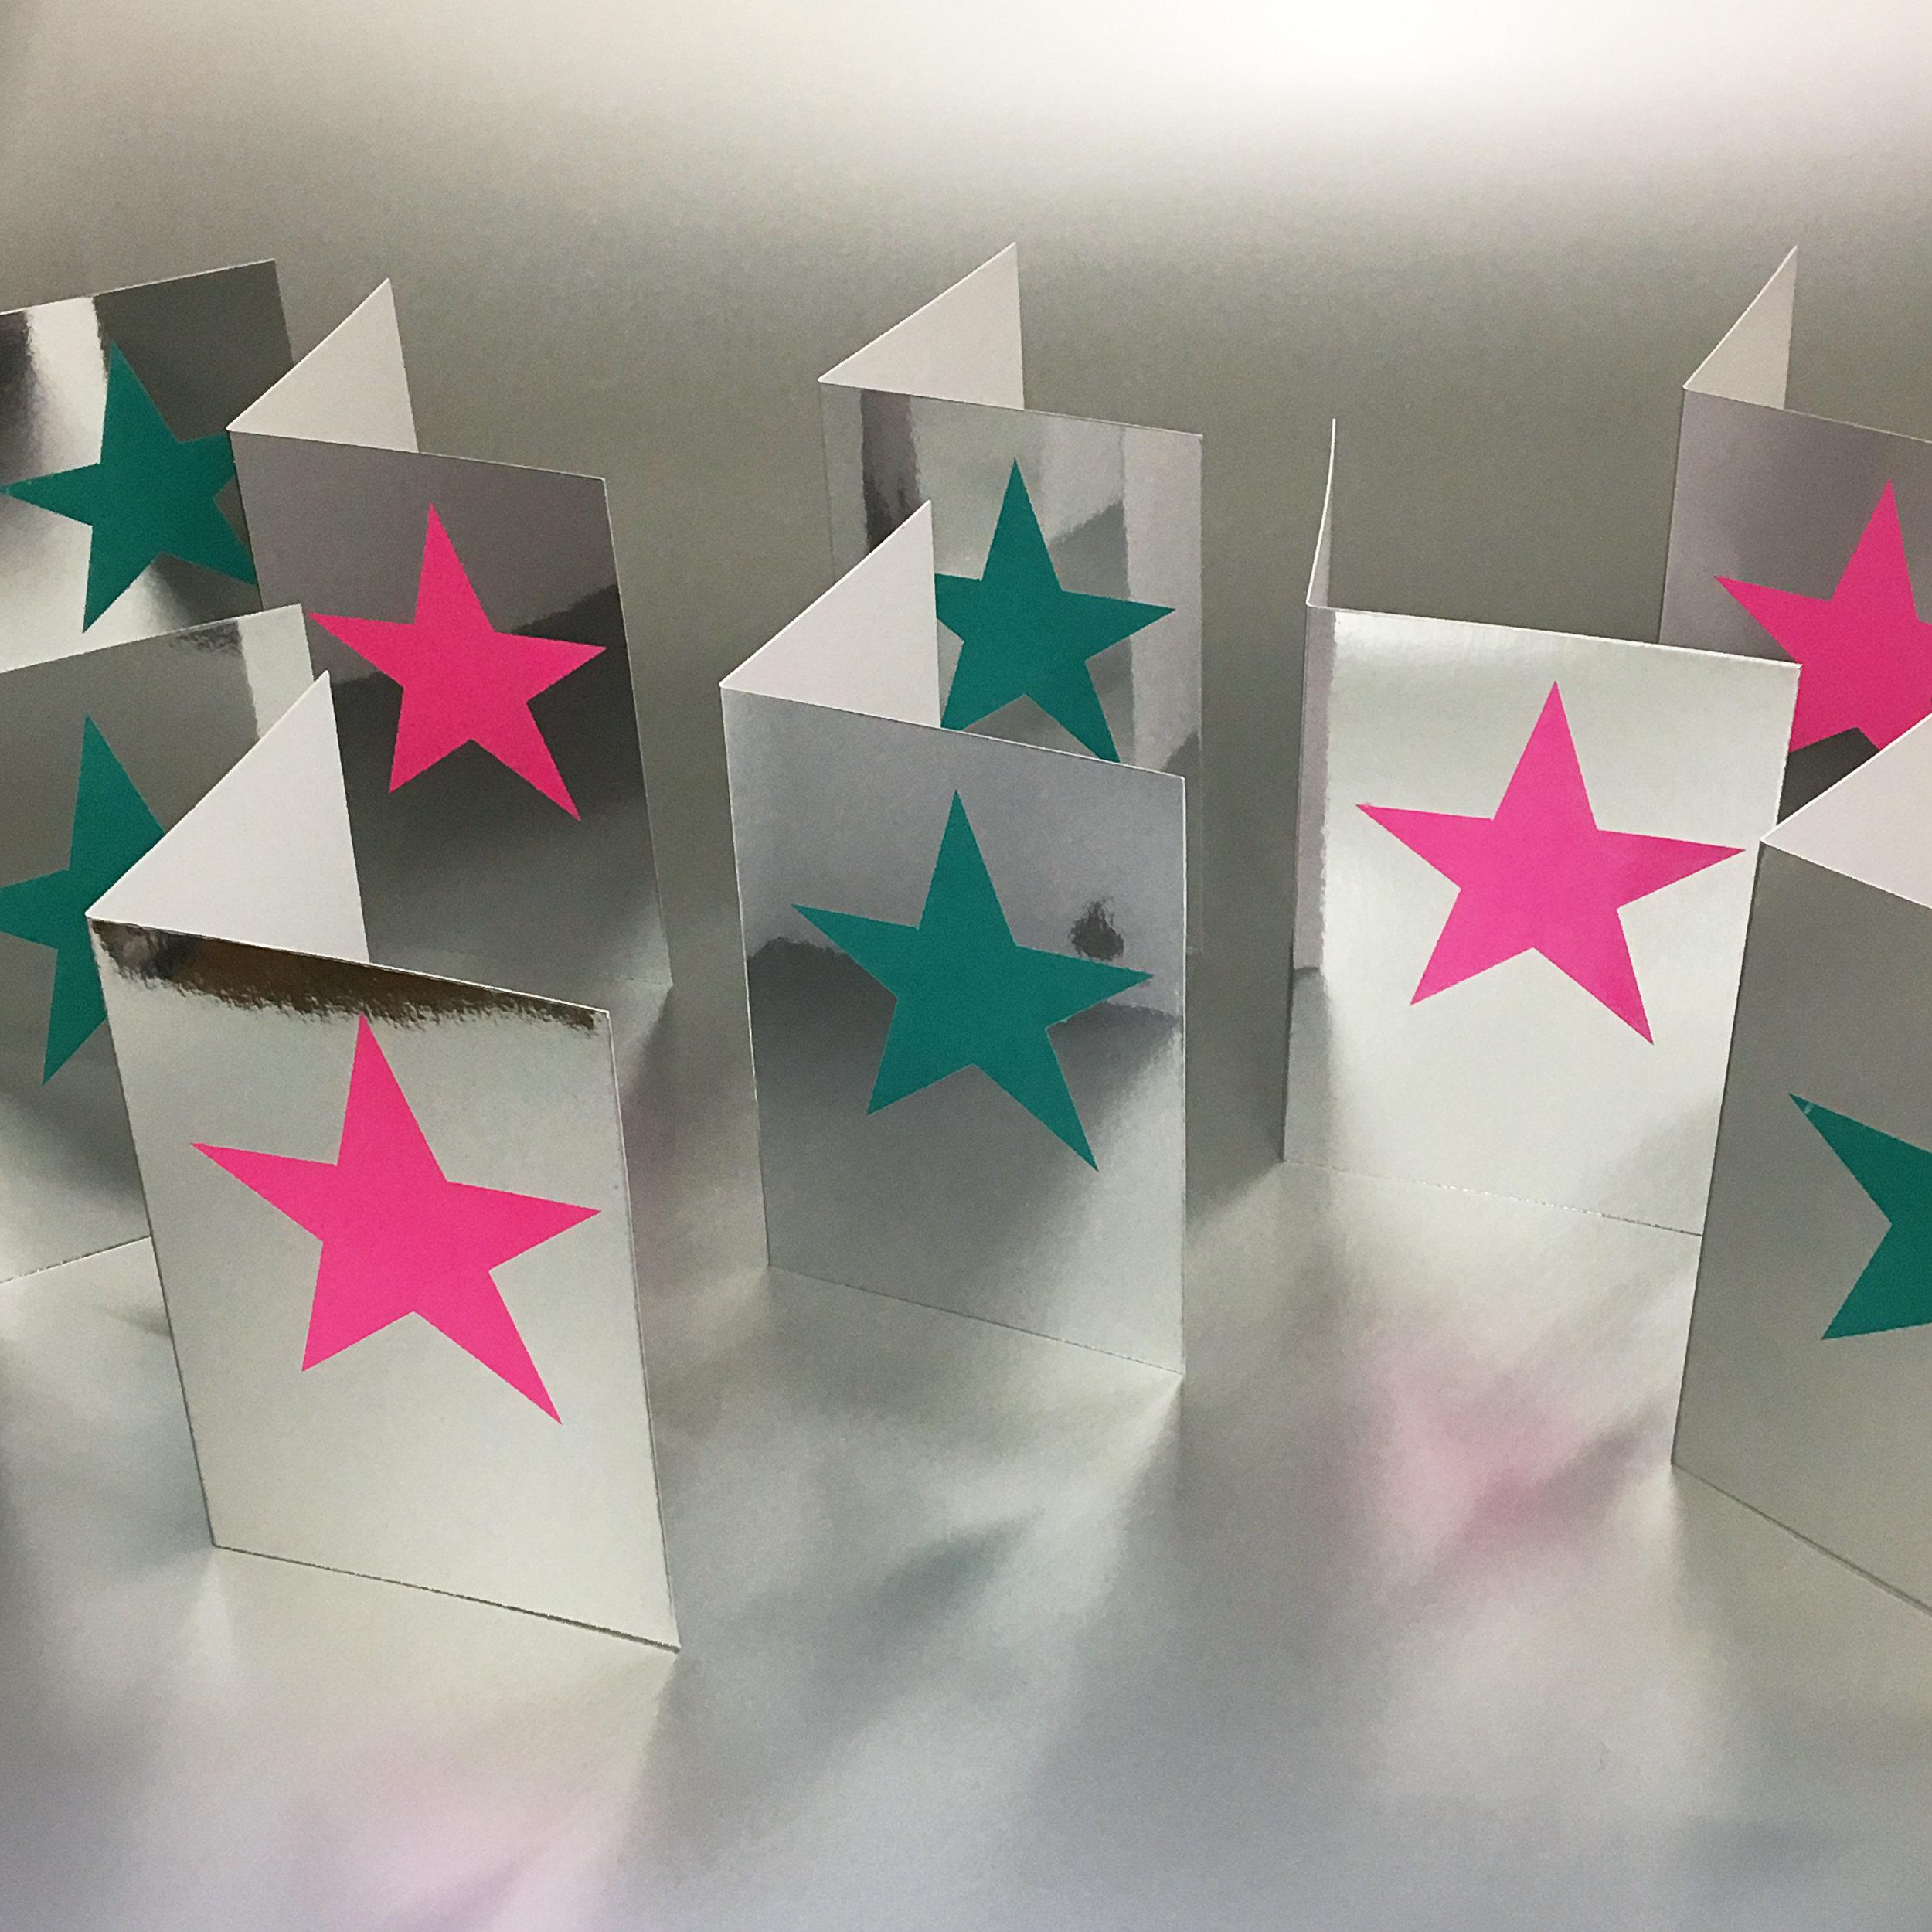 Jane Bain_Star cards_1_silkscreen print.jpg